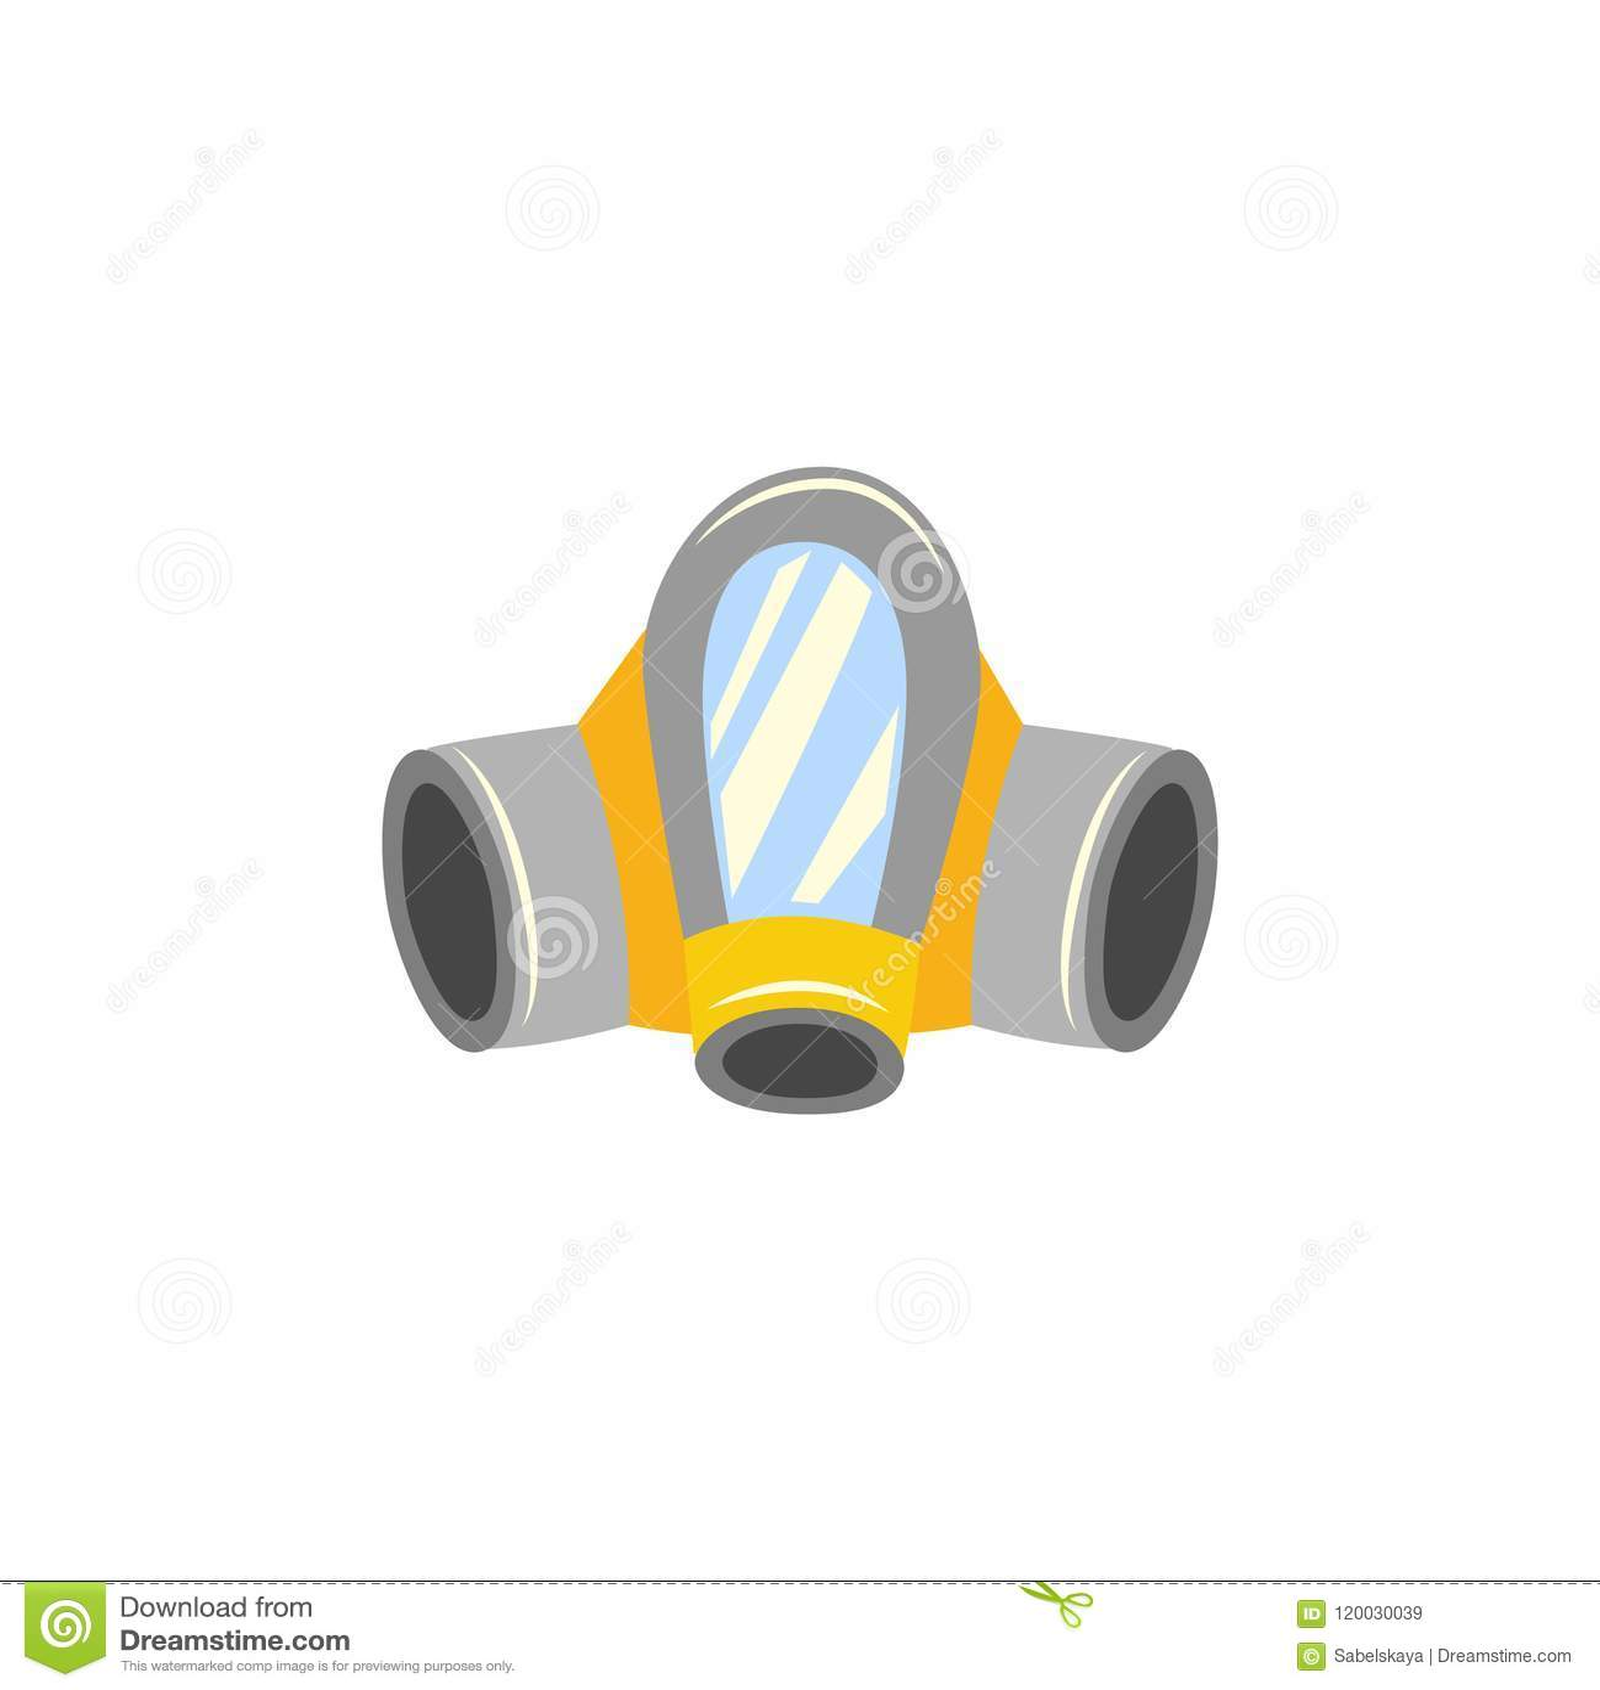 masque de protection biologique